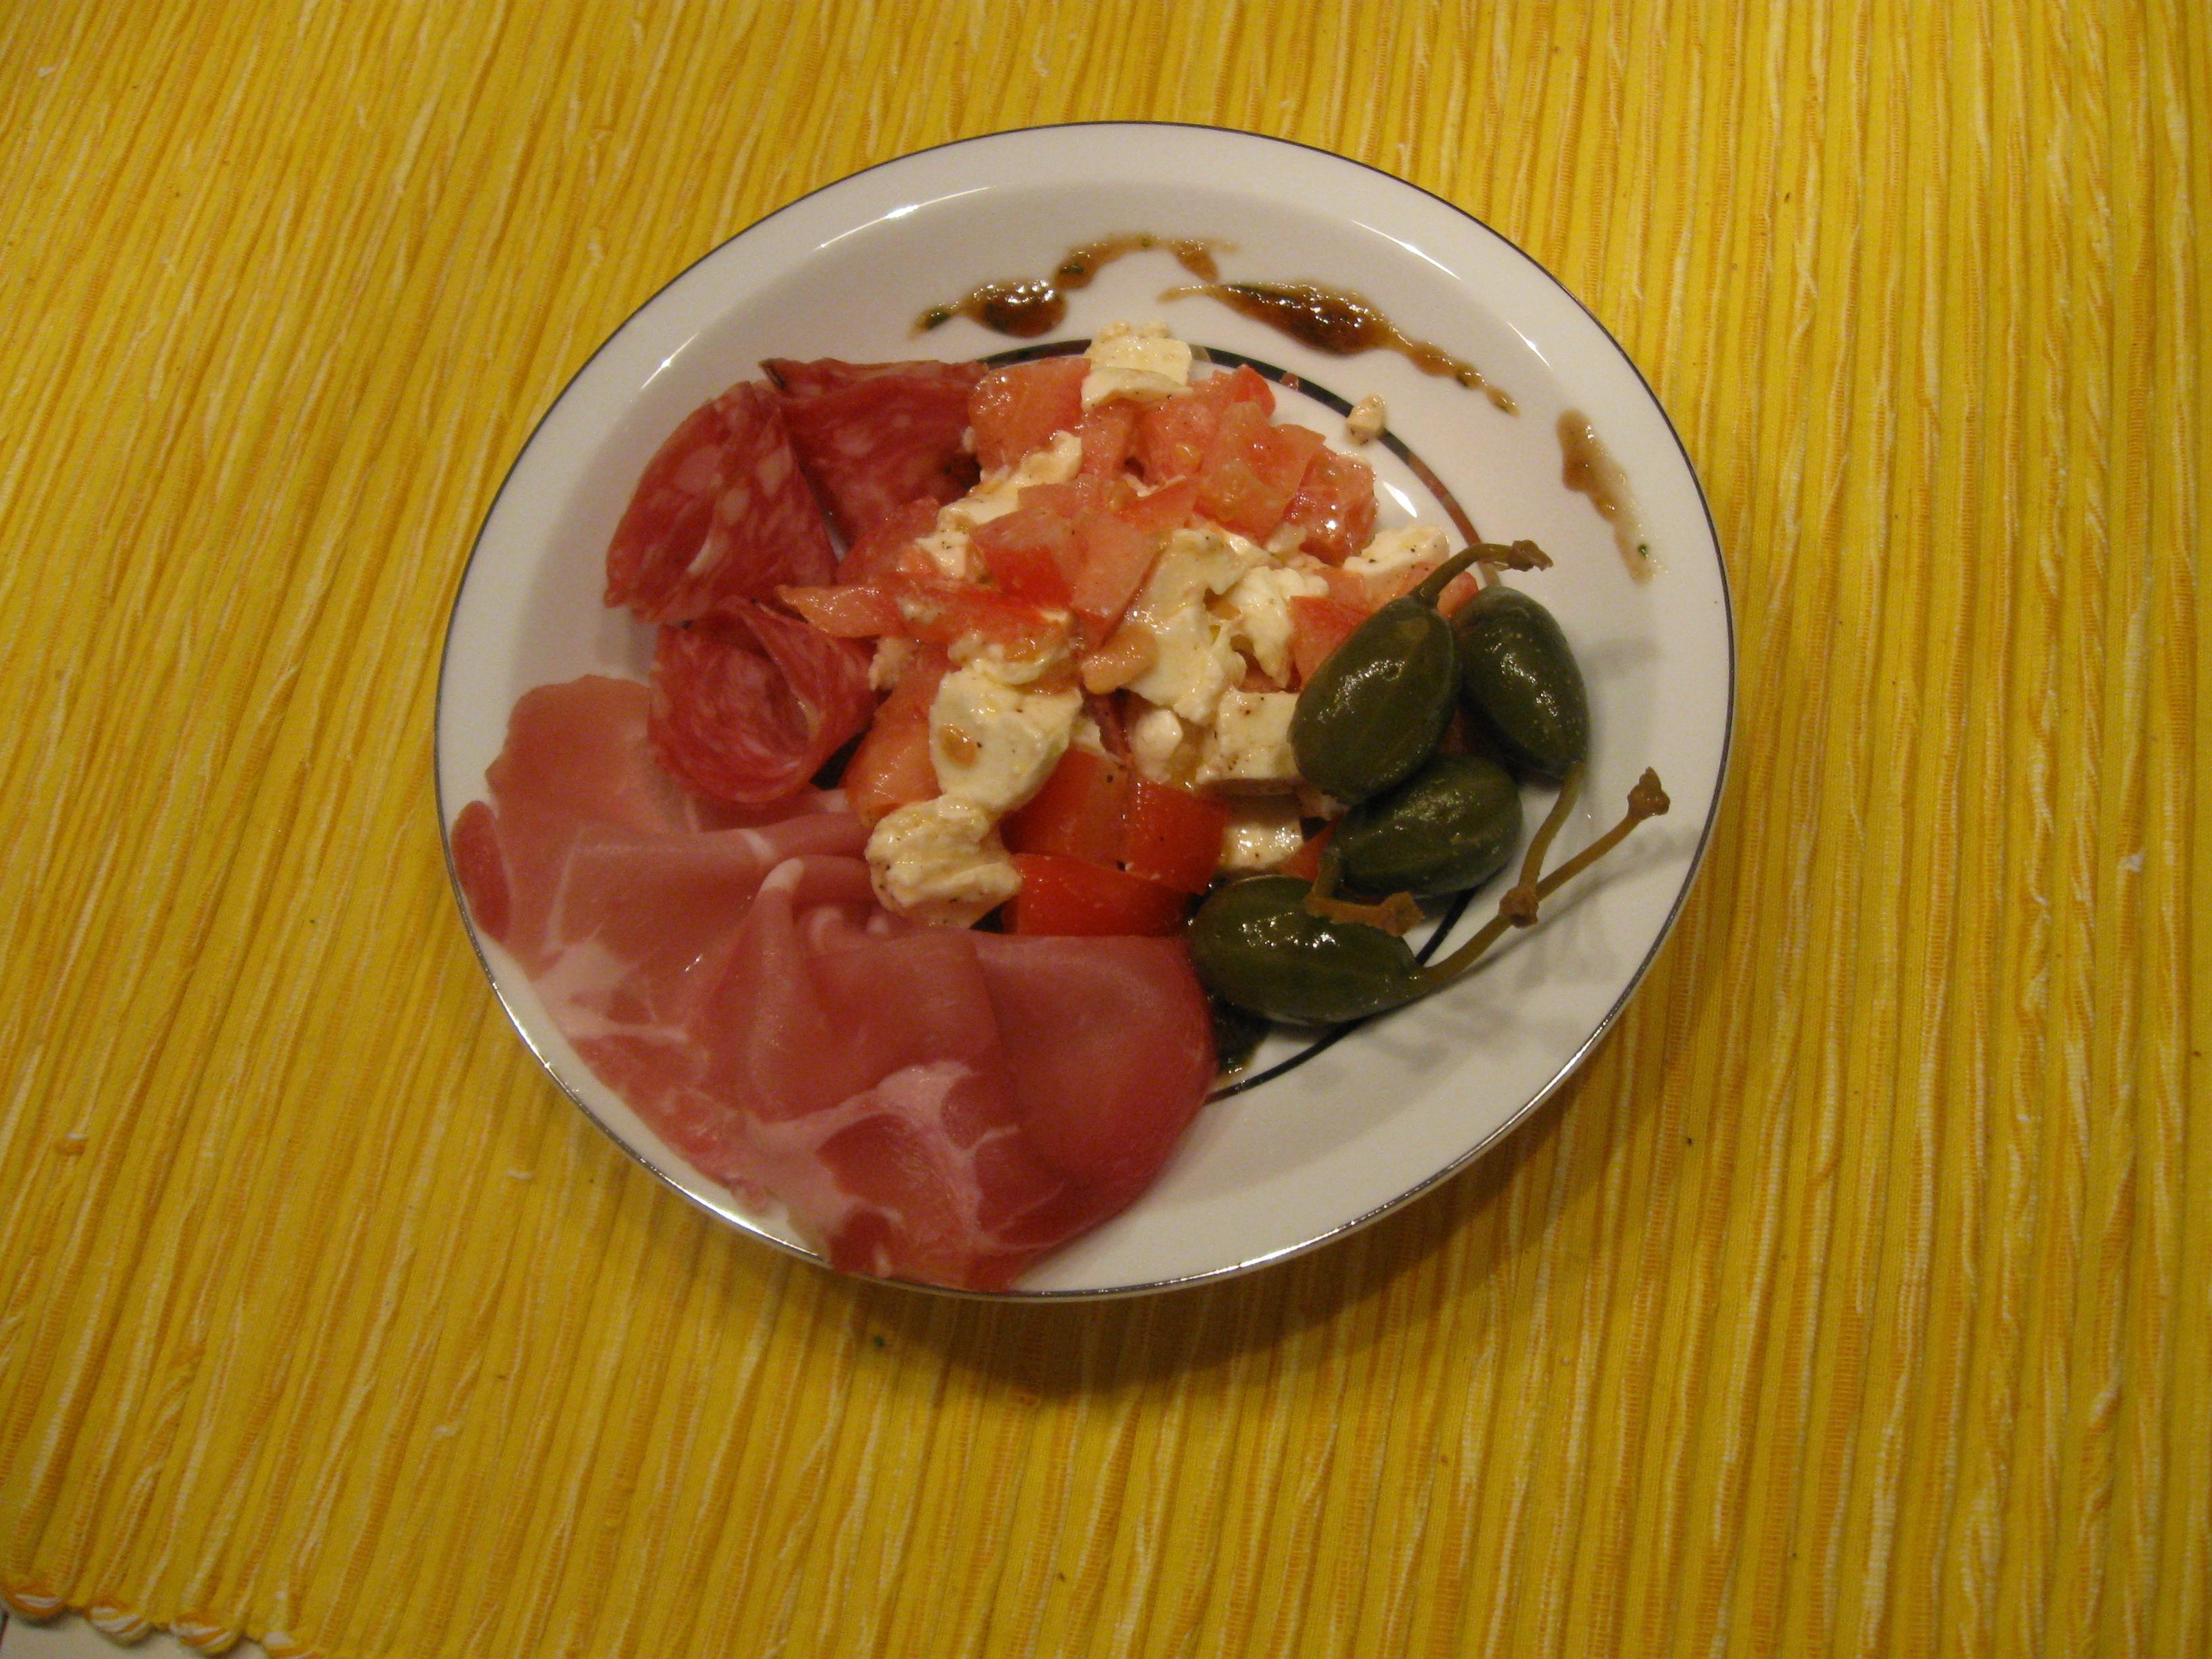 Toscana delight